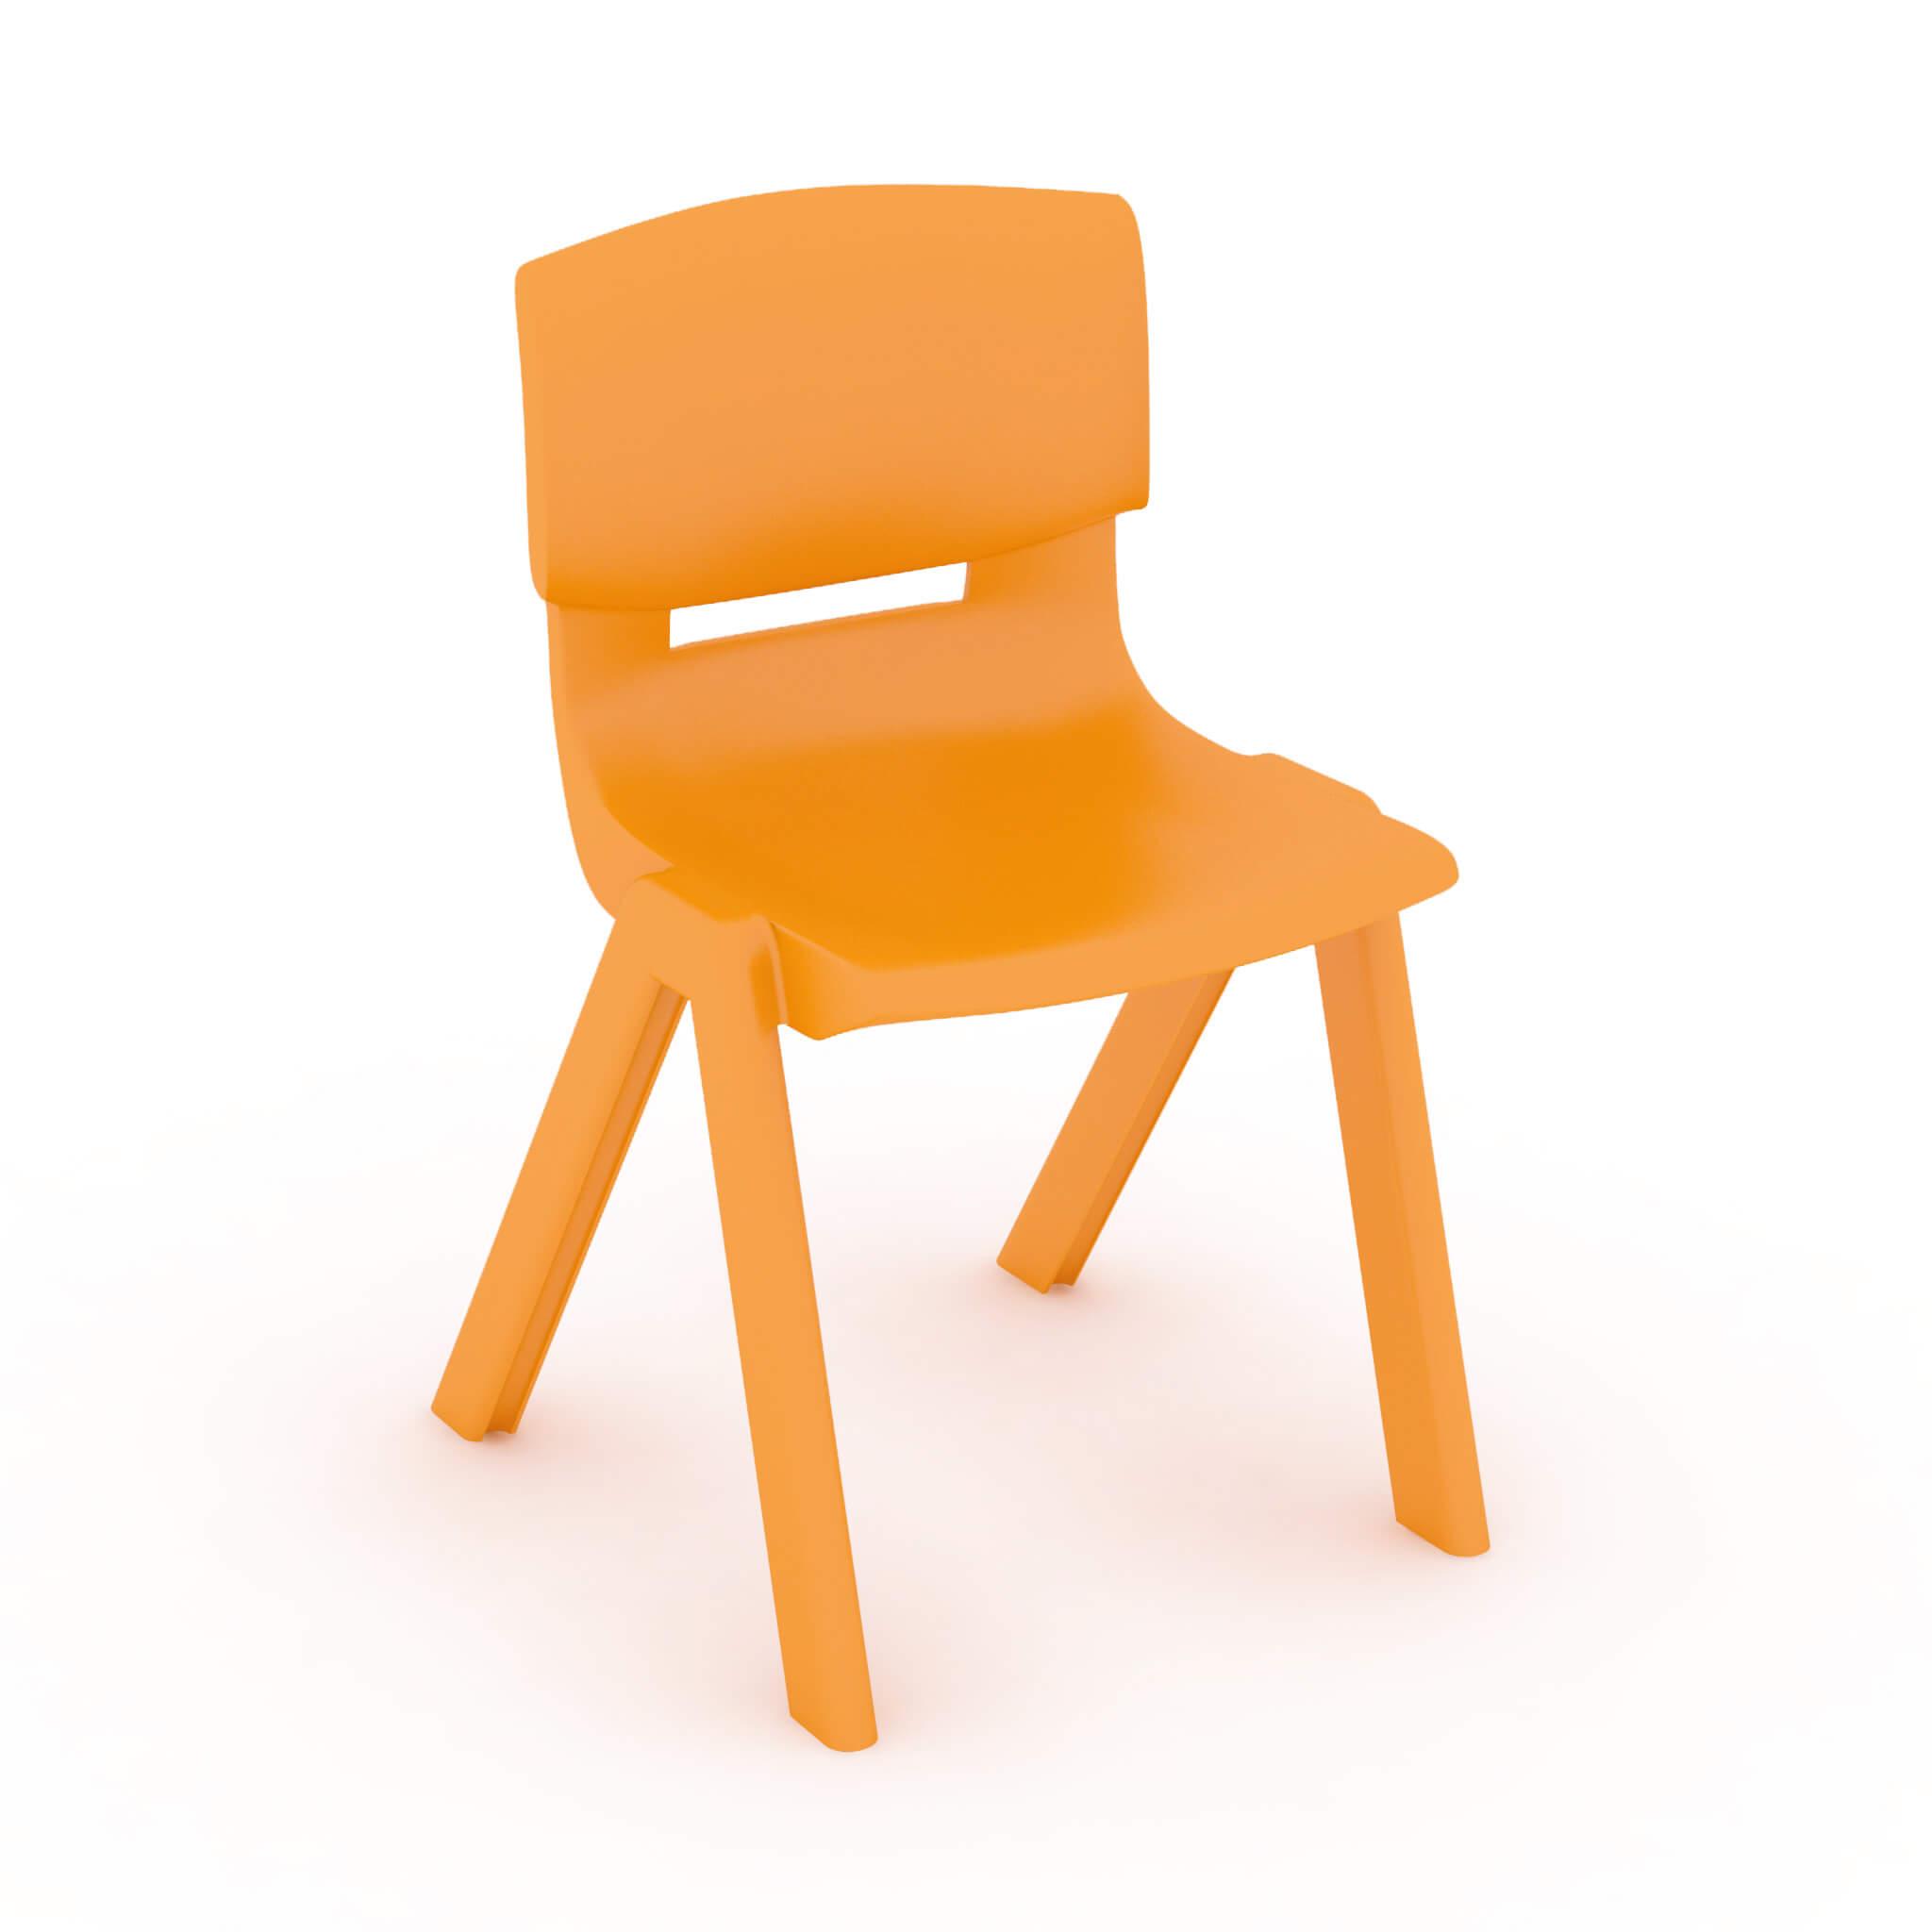 Silla escolar infantil naranja